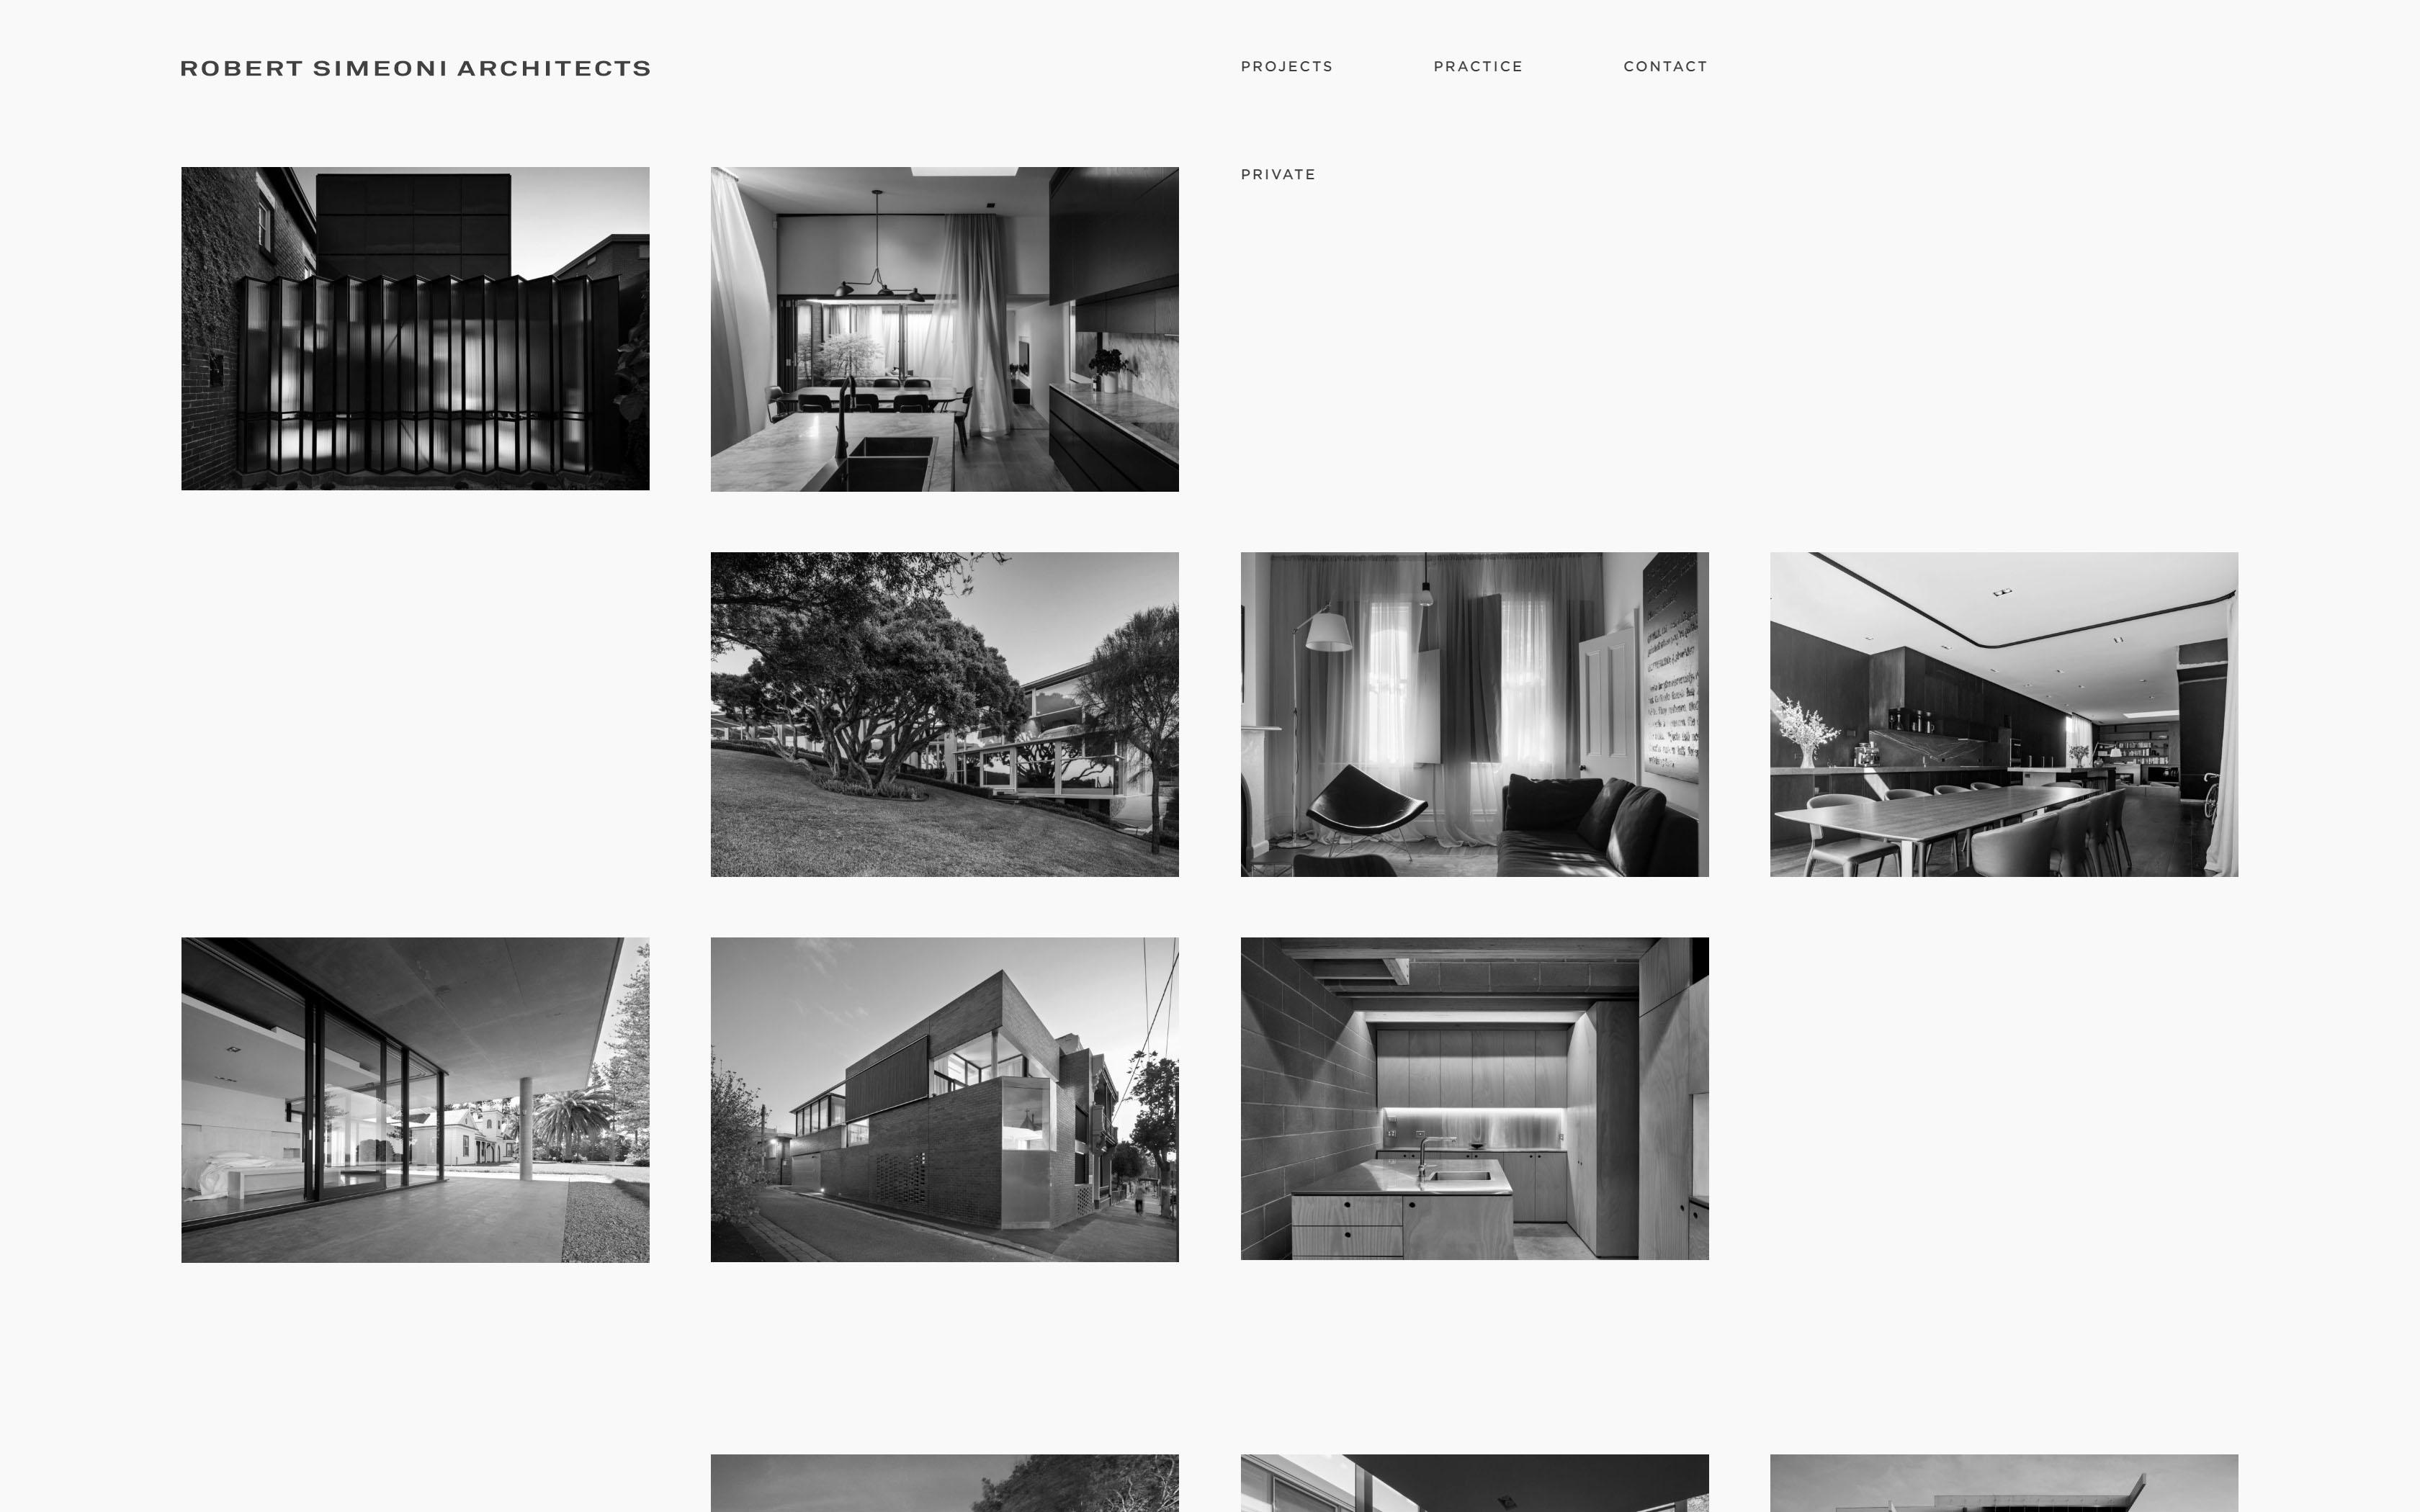 rsa-desktop-private-projects.jpg